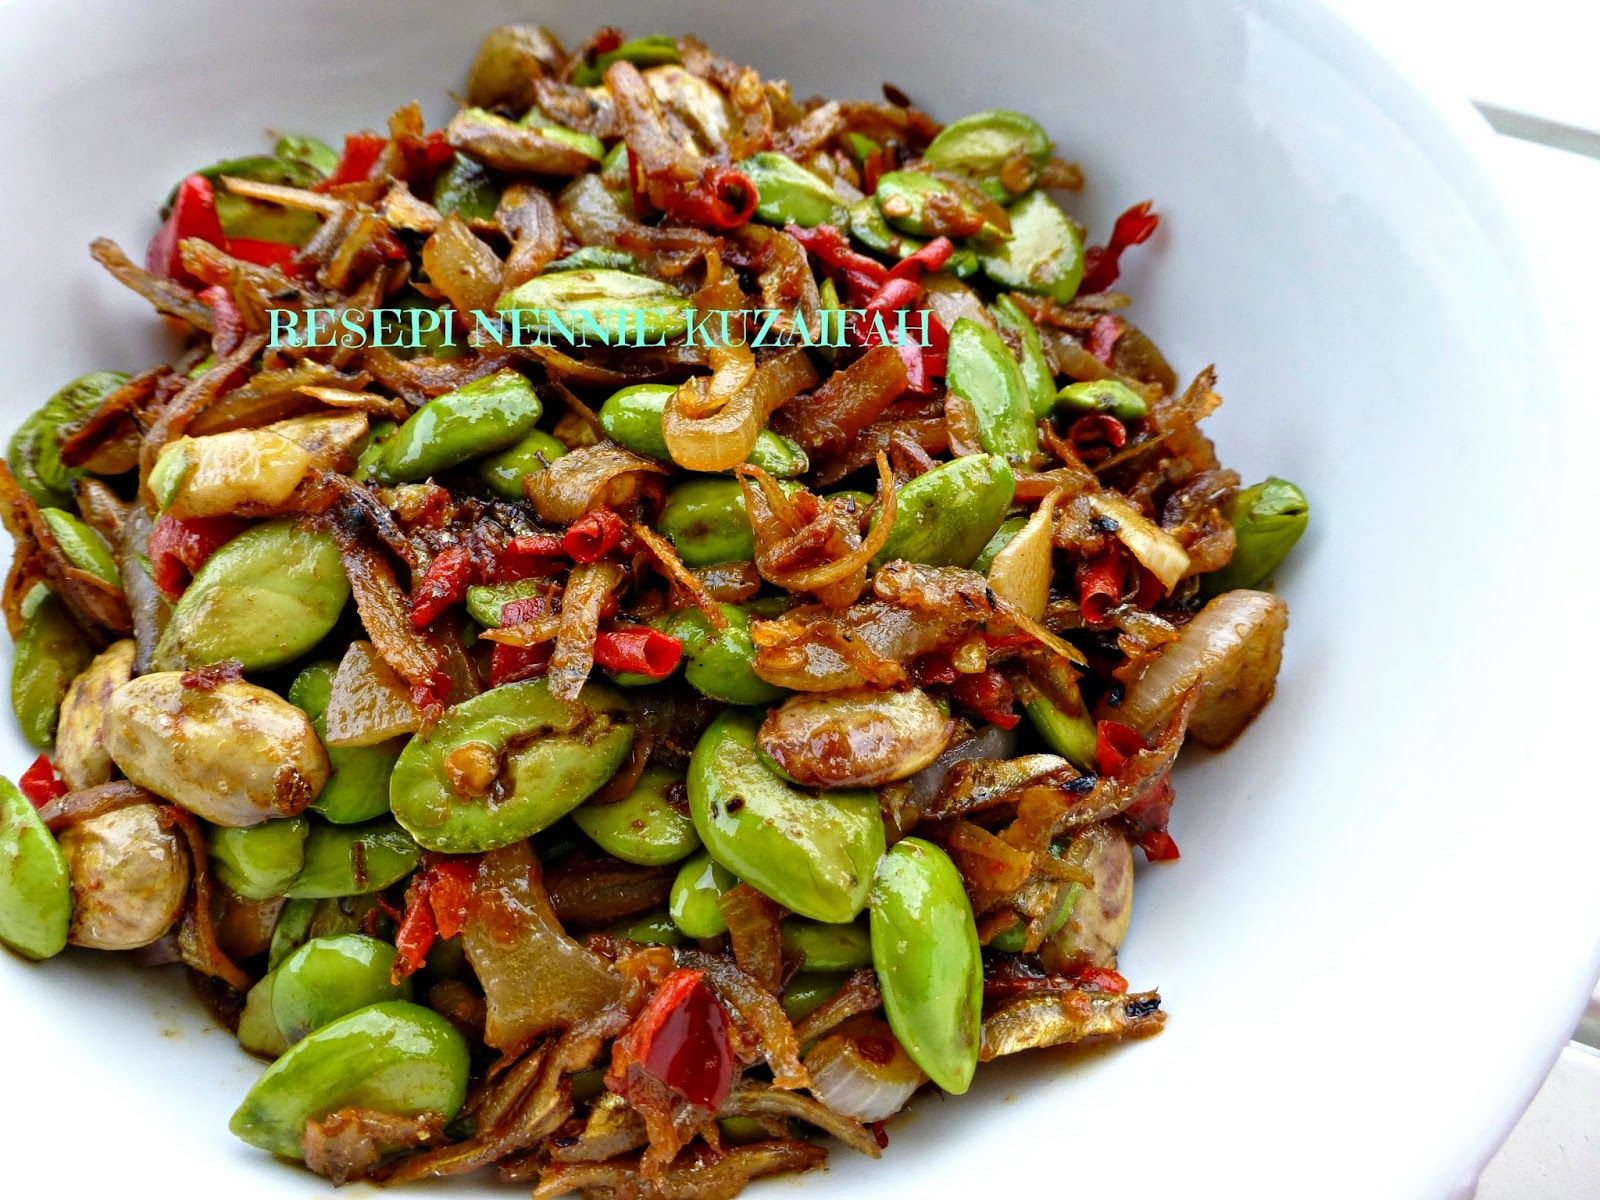 Resepi Nennie Khuzaifah Sambal Petai Ikan Bilis Resep Masakan Resep Masakan Asia Resep Makanan